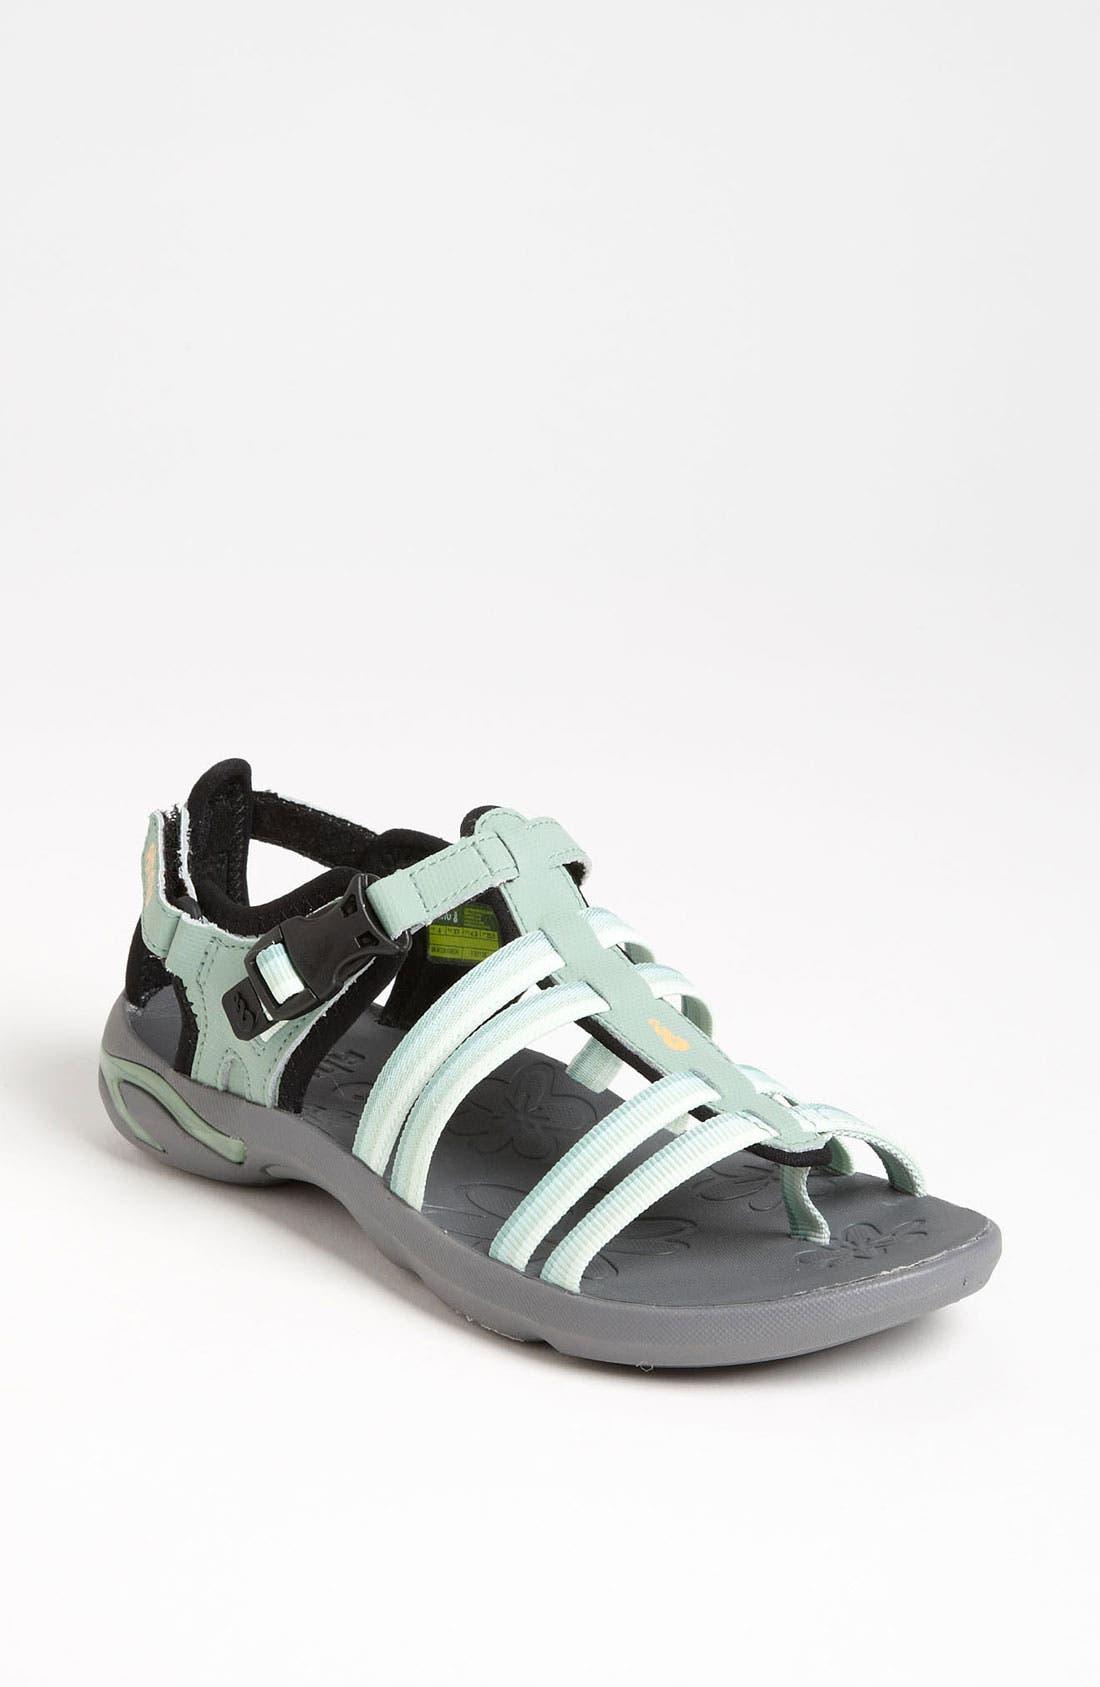 Main Image - Ahnu 'Pescadero' Sandal